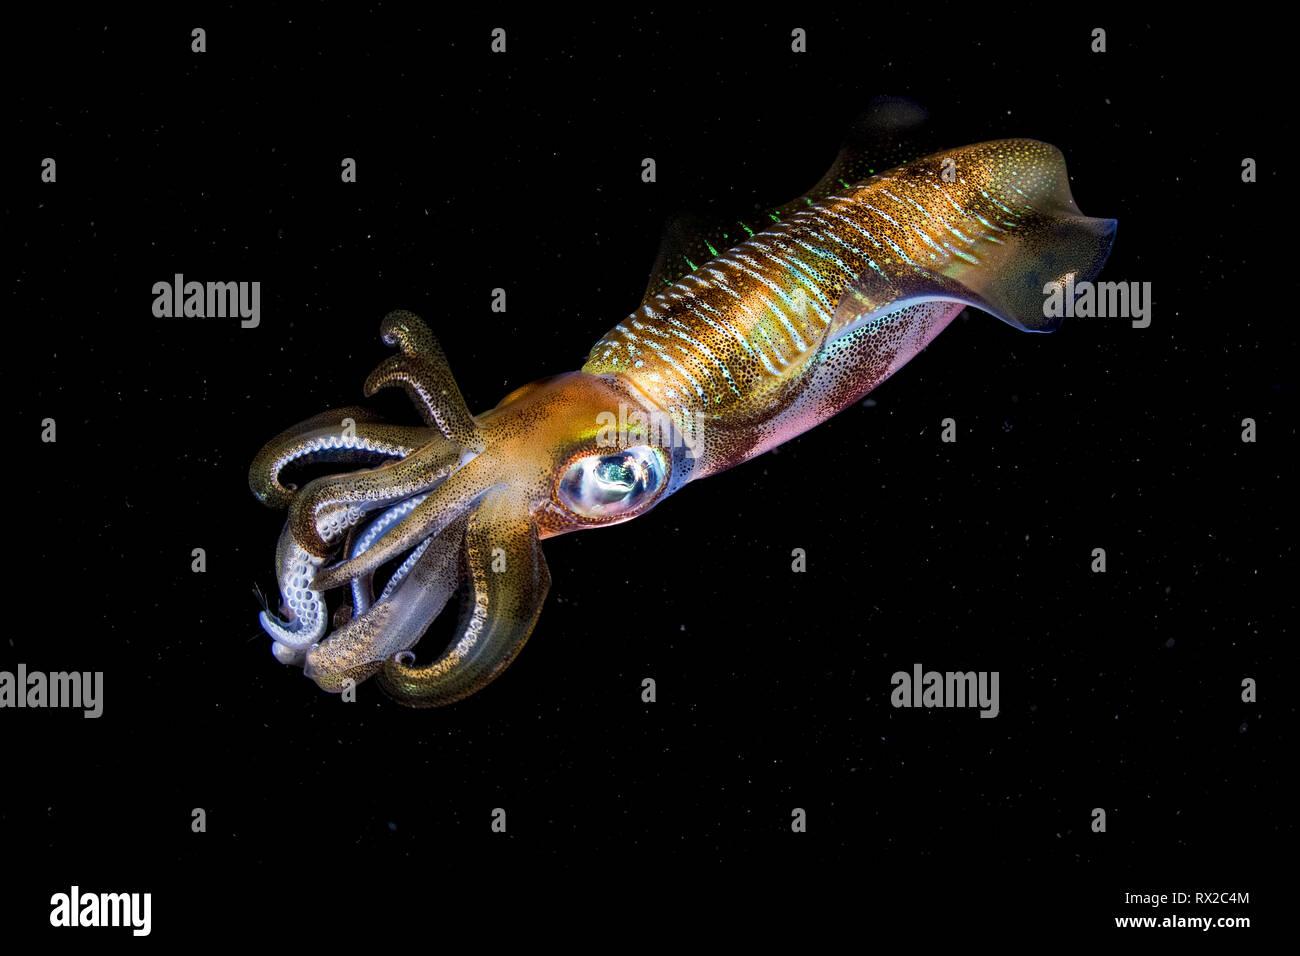 bigfin reef squid, Sepioteuthis lessoniana, aka oval squid, at night, Komodo National Park, Komodo, Lesser Sunda Islands, Indonesia, Indo-Pacific Ocea - Stock Image